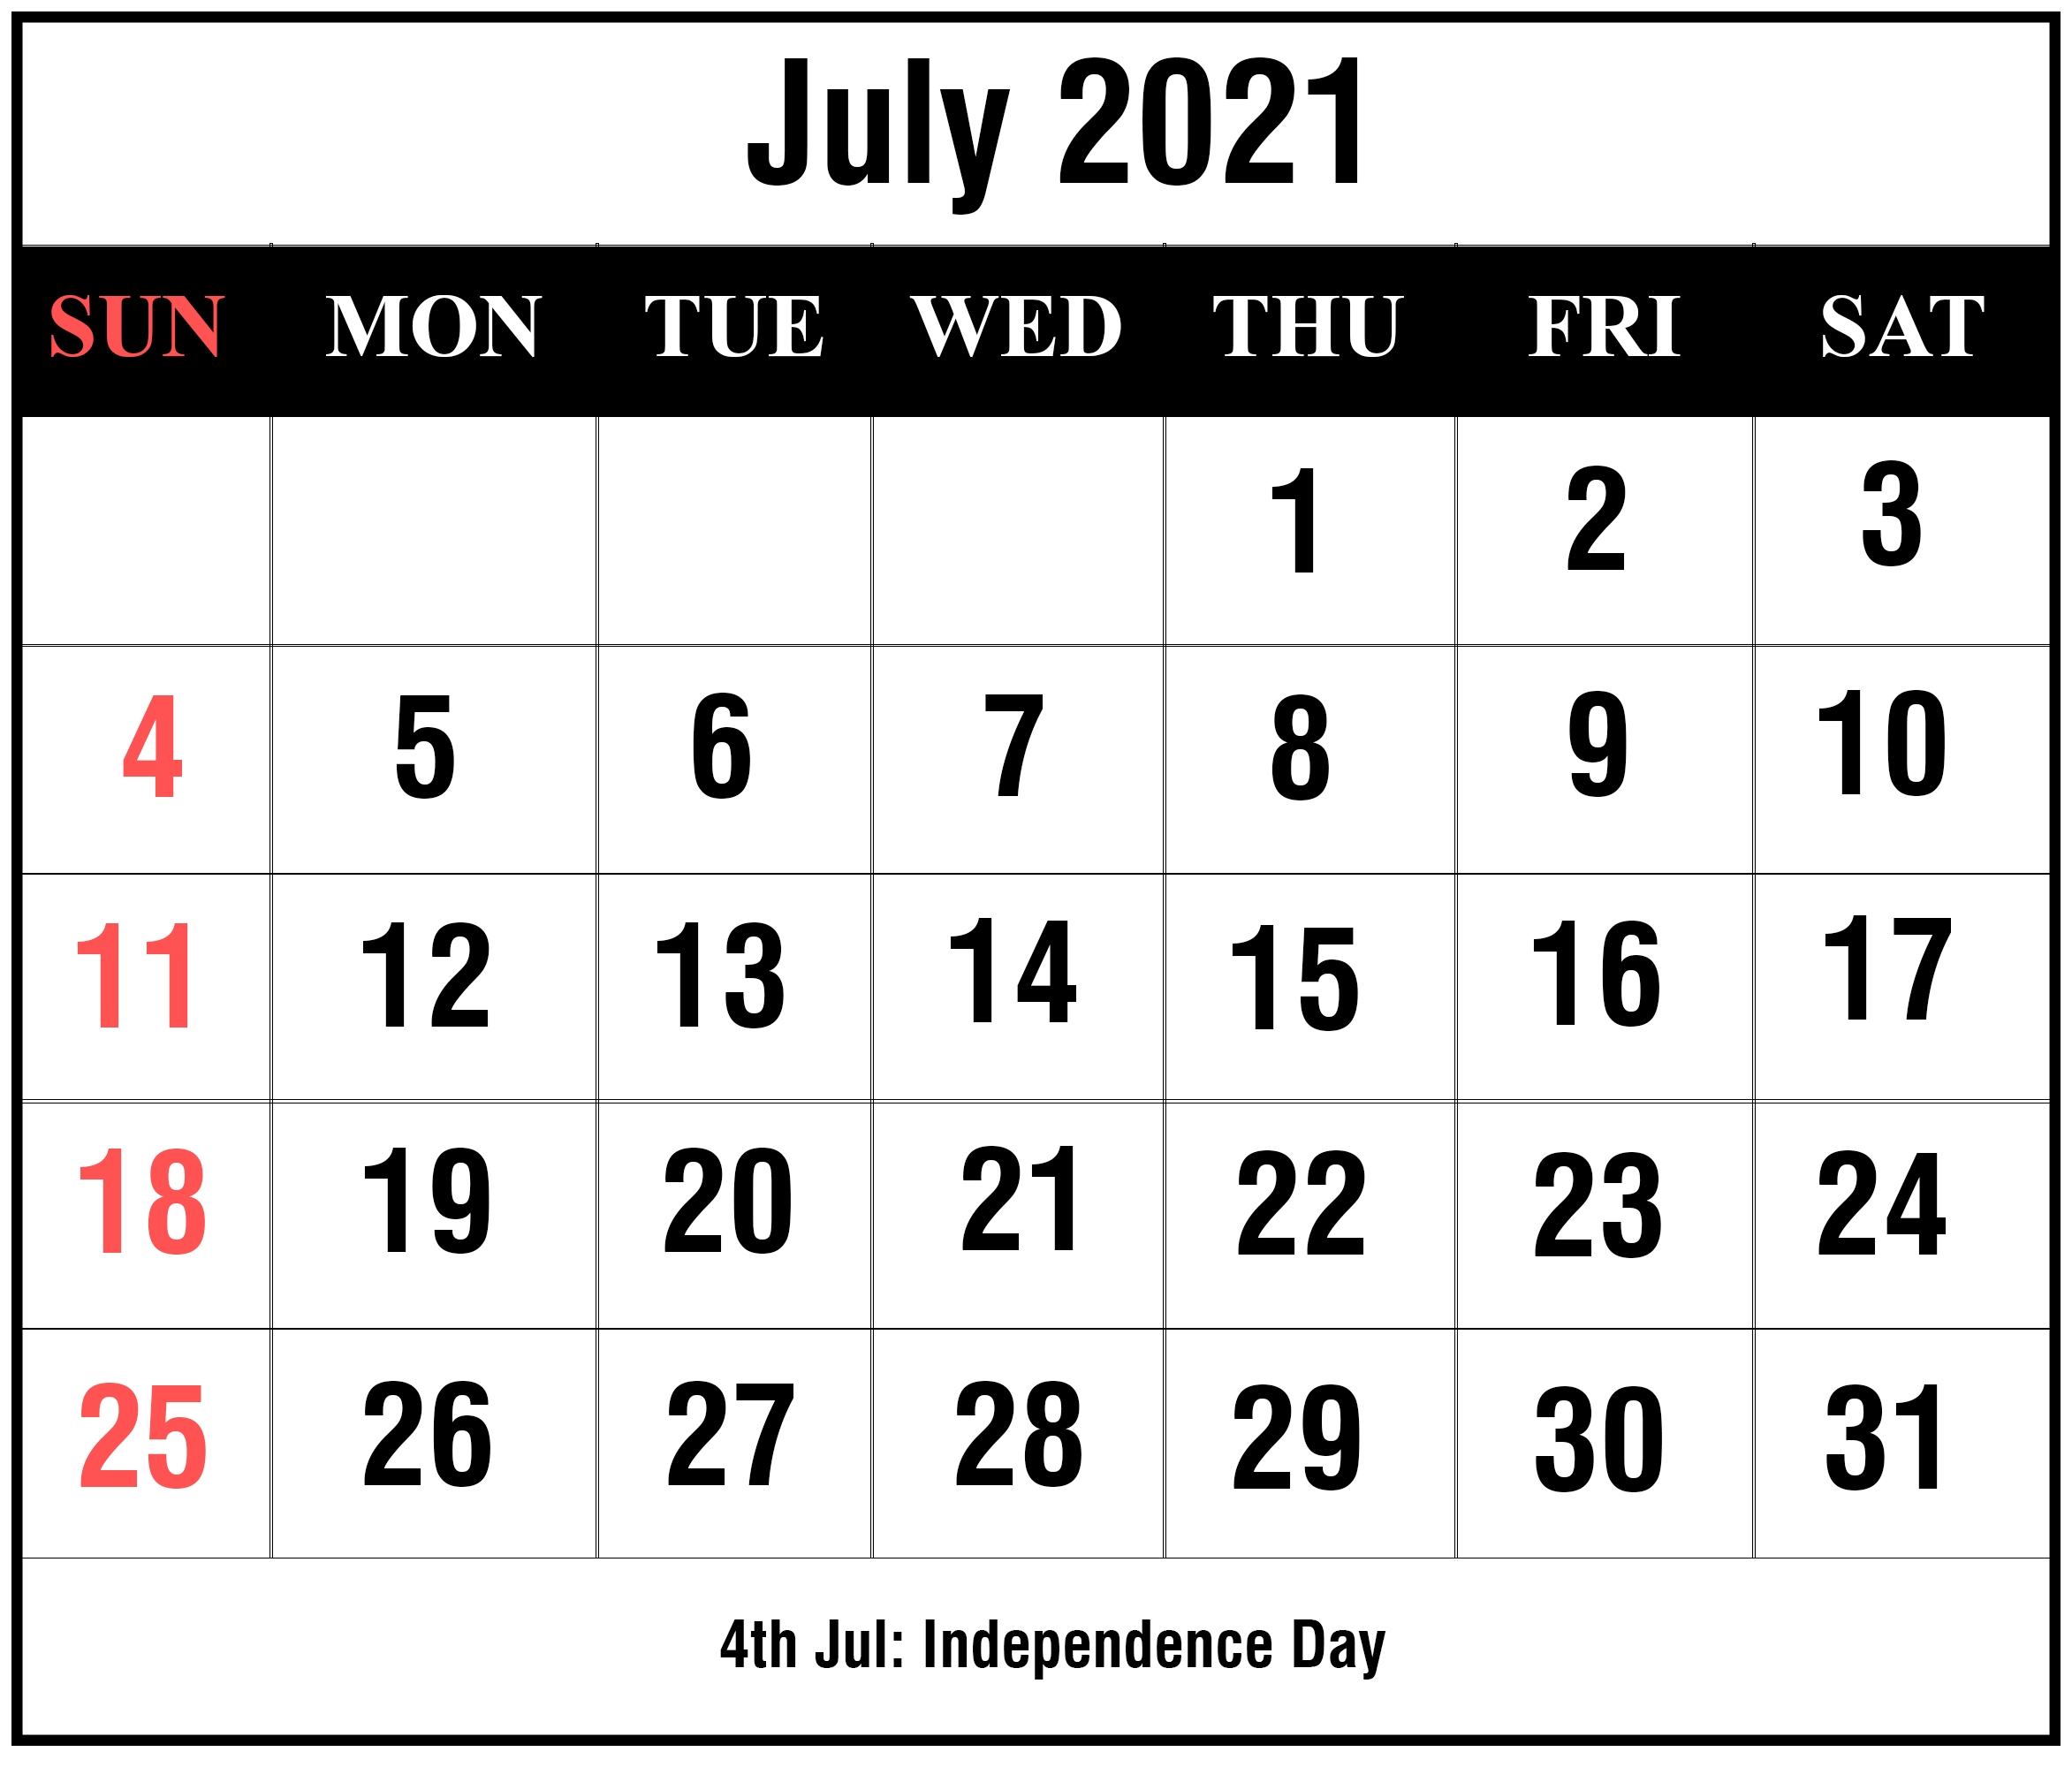 July 2021 Calendar With Holidays | Printable July Calendar